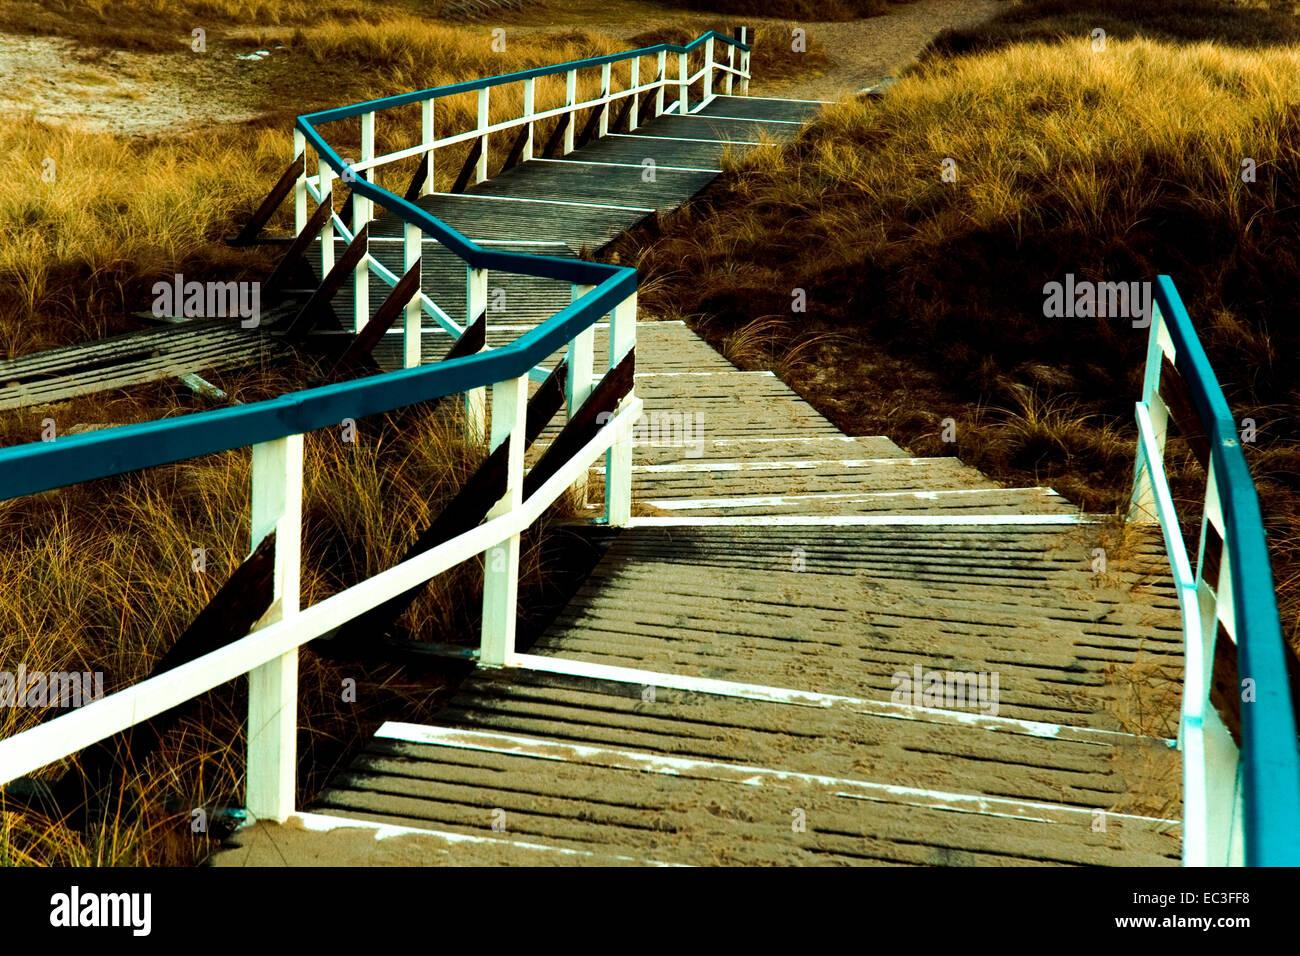 Dune web - Stock Image